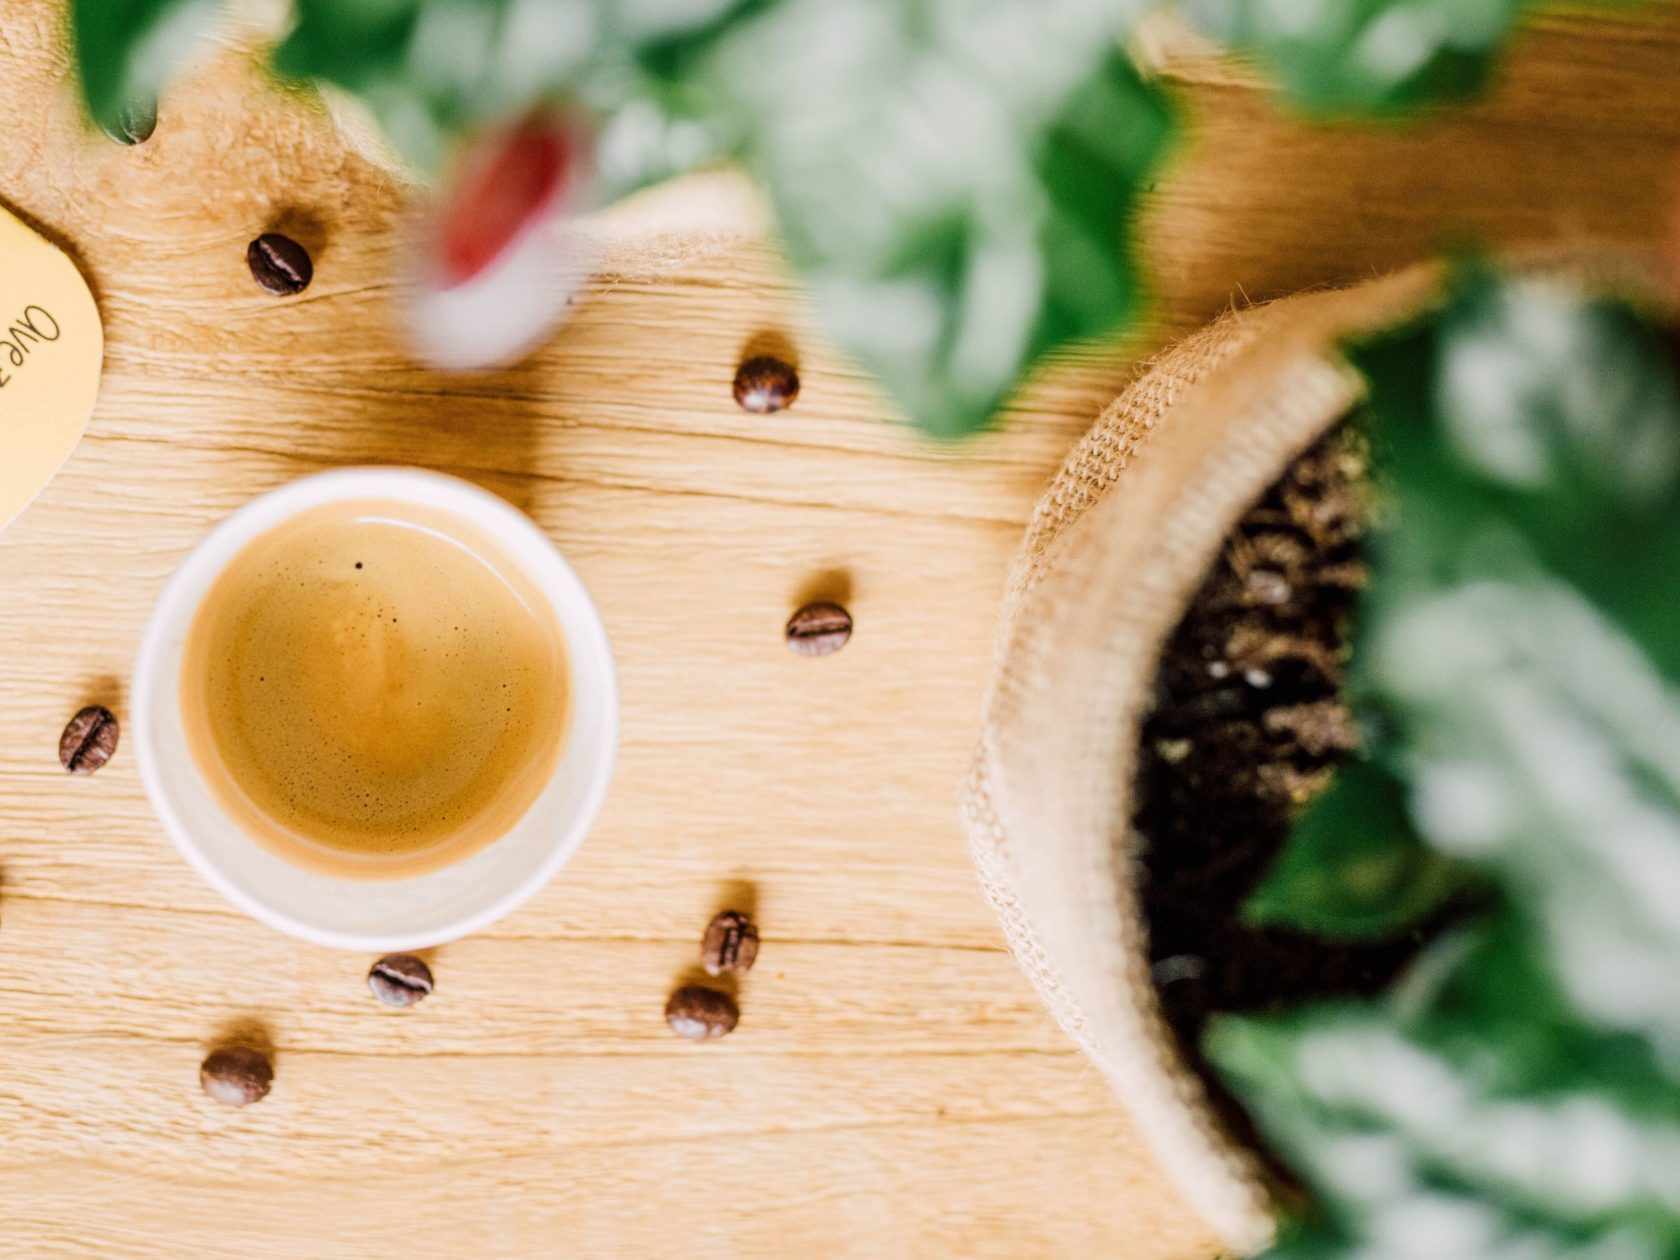 Le lot de 10 sachets Espresso Barista Blend® + 1 sachet OFFERT Espresso Vanille Macadamia – Senseo®